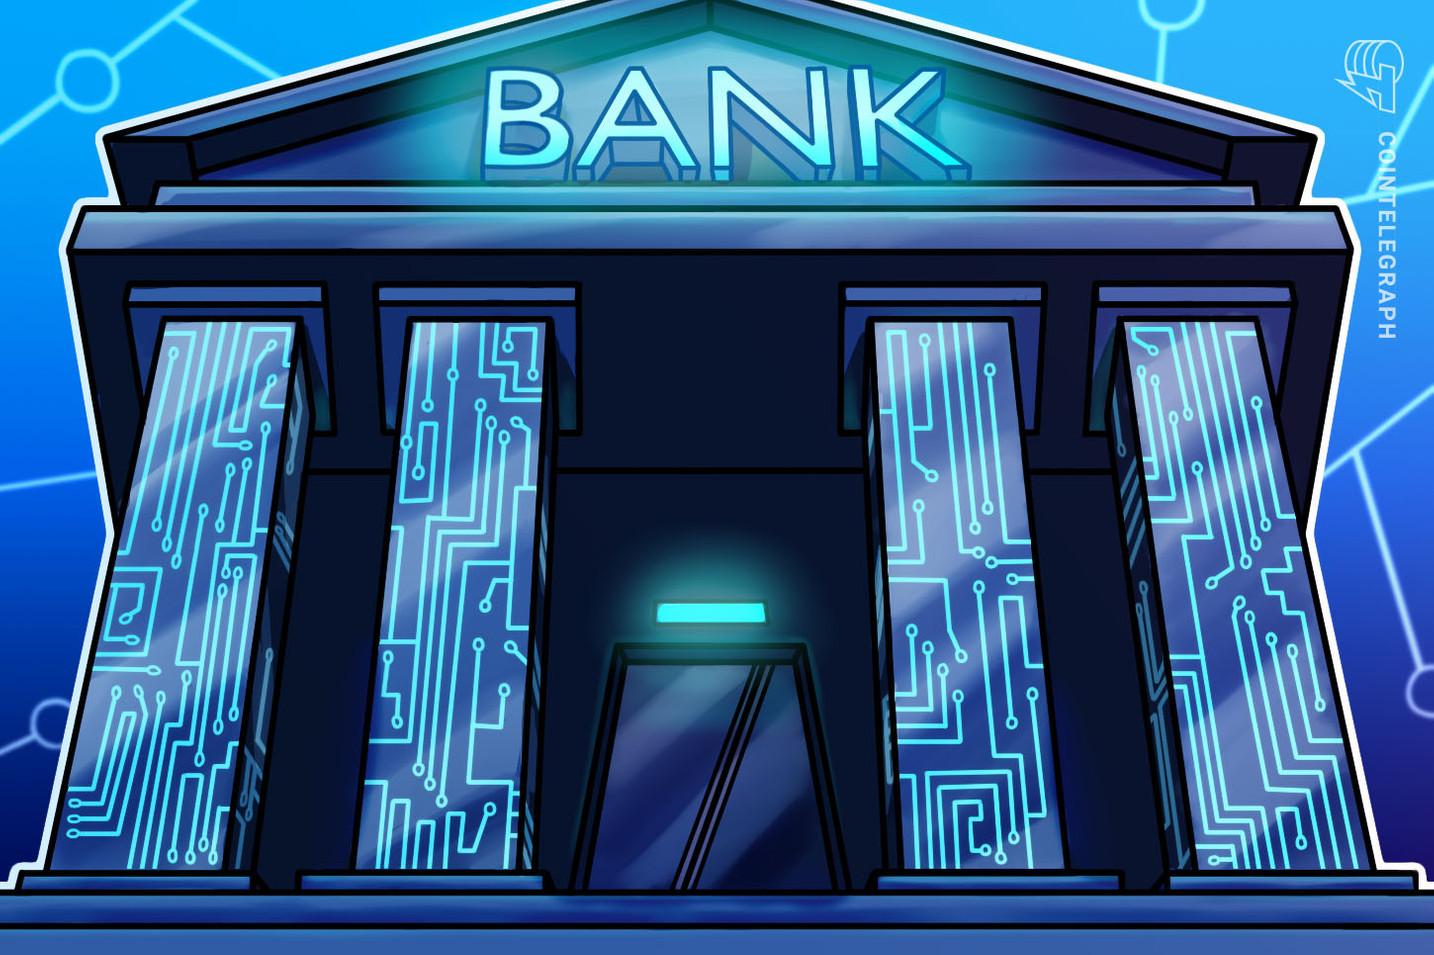 Standard Chartered Makes Letter of Credit Transaction Using Blockchain